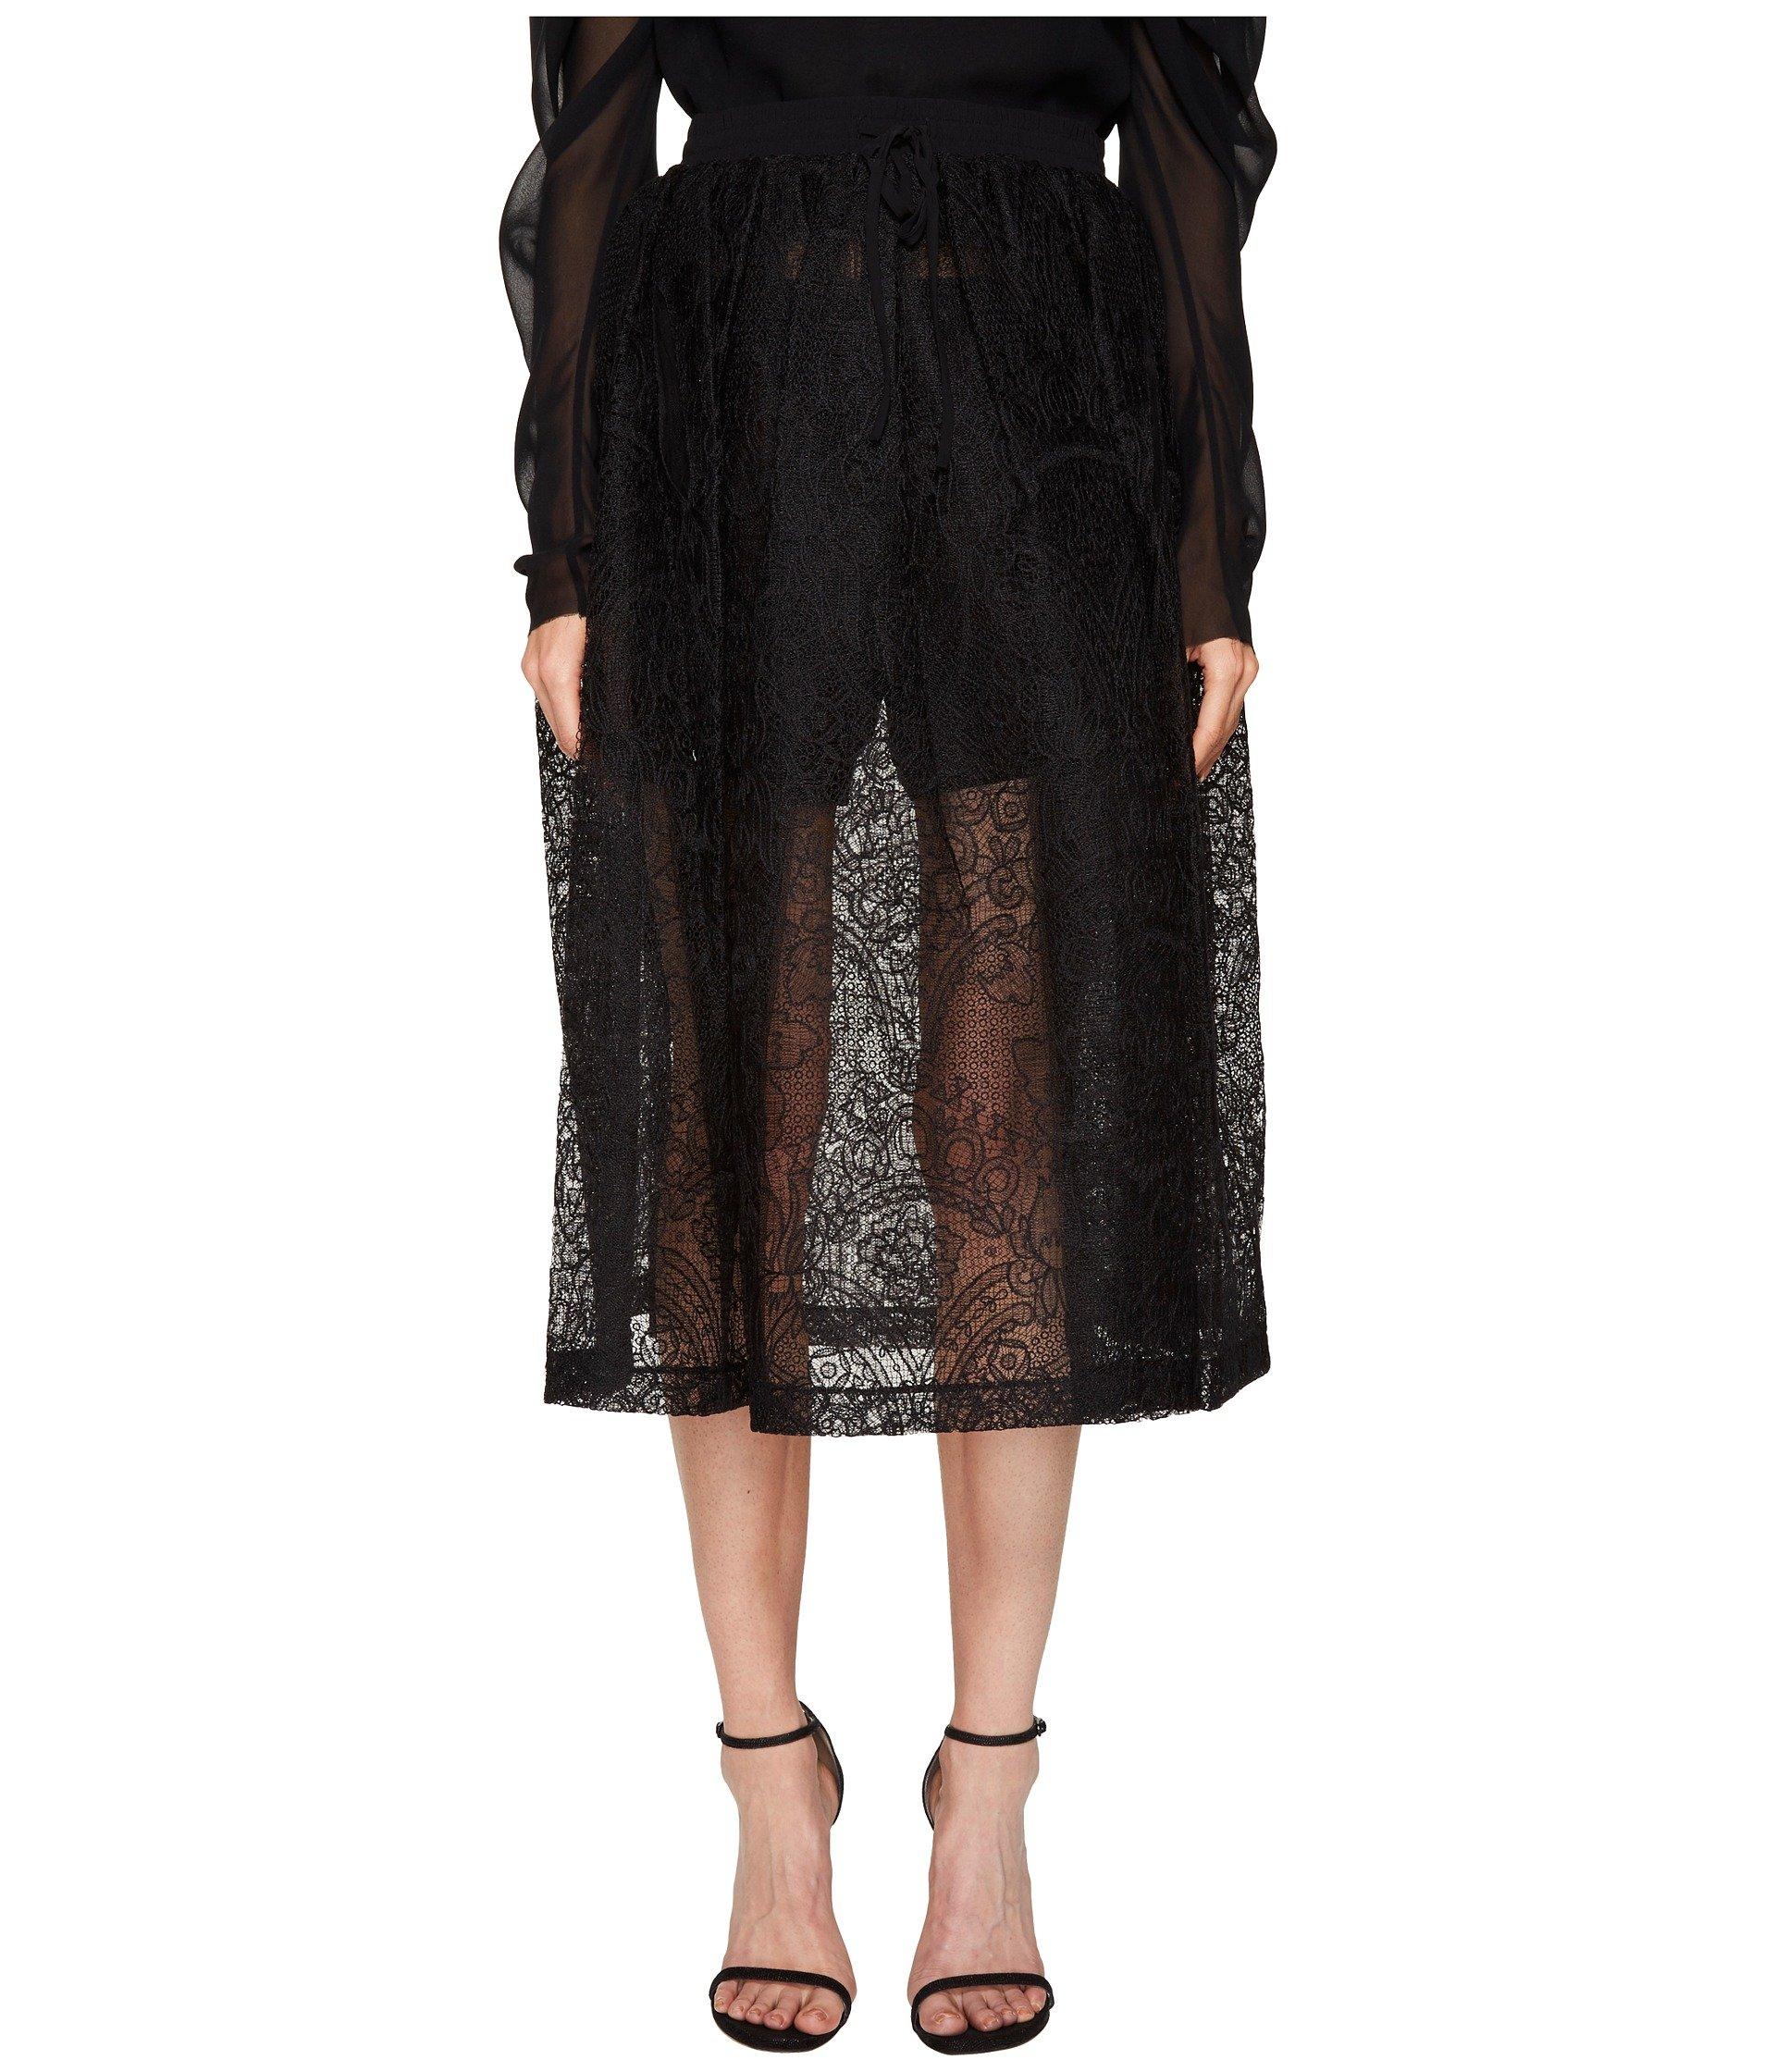 Mid Calf Skirt with Draw Cord Waistband